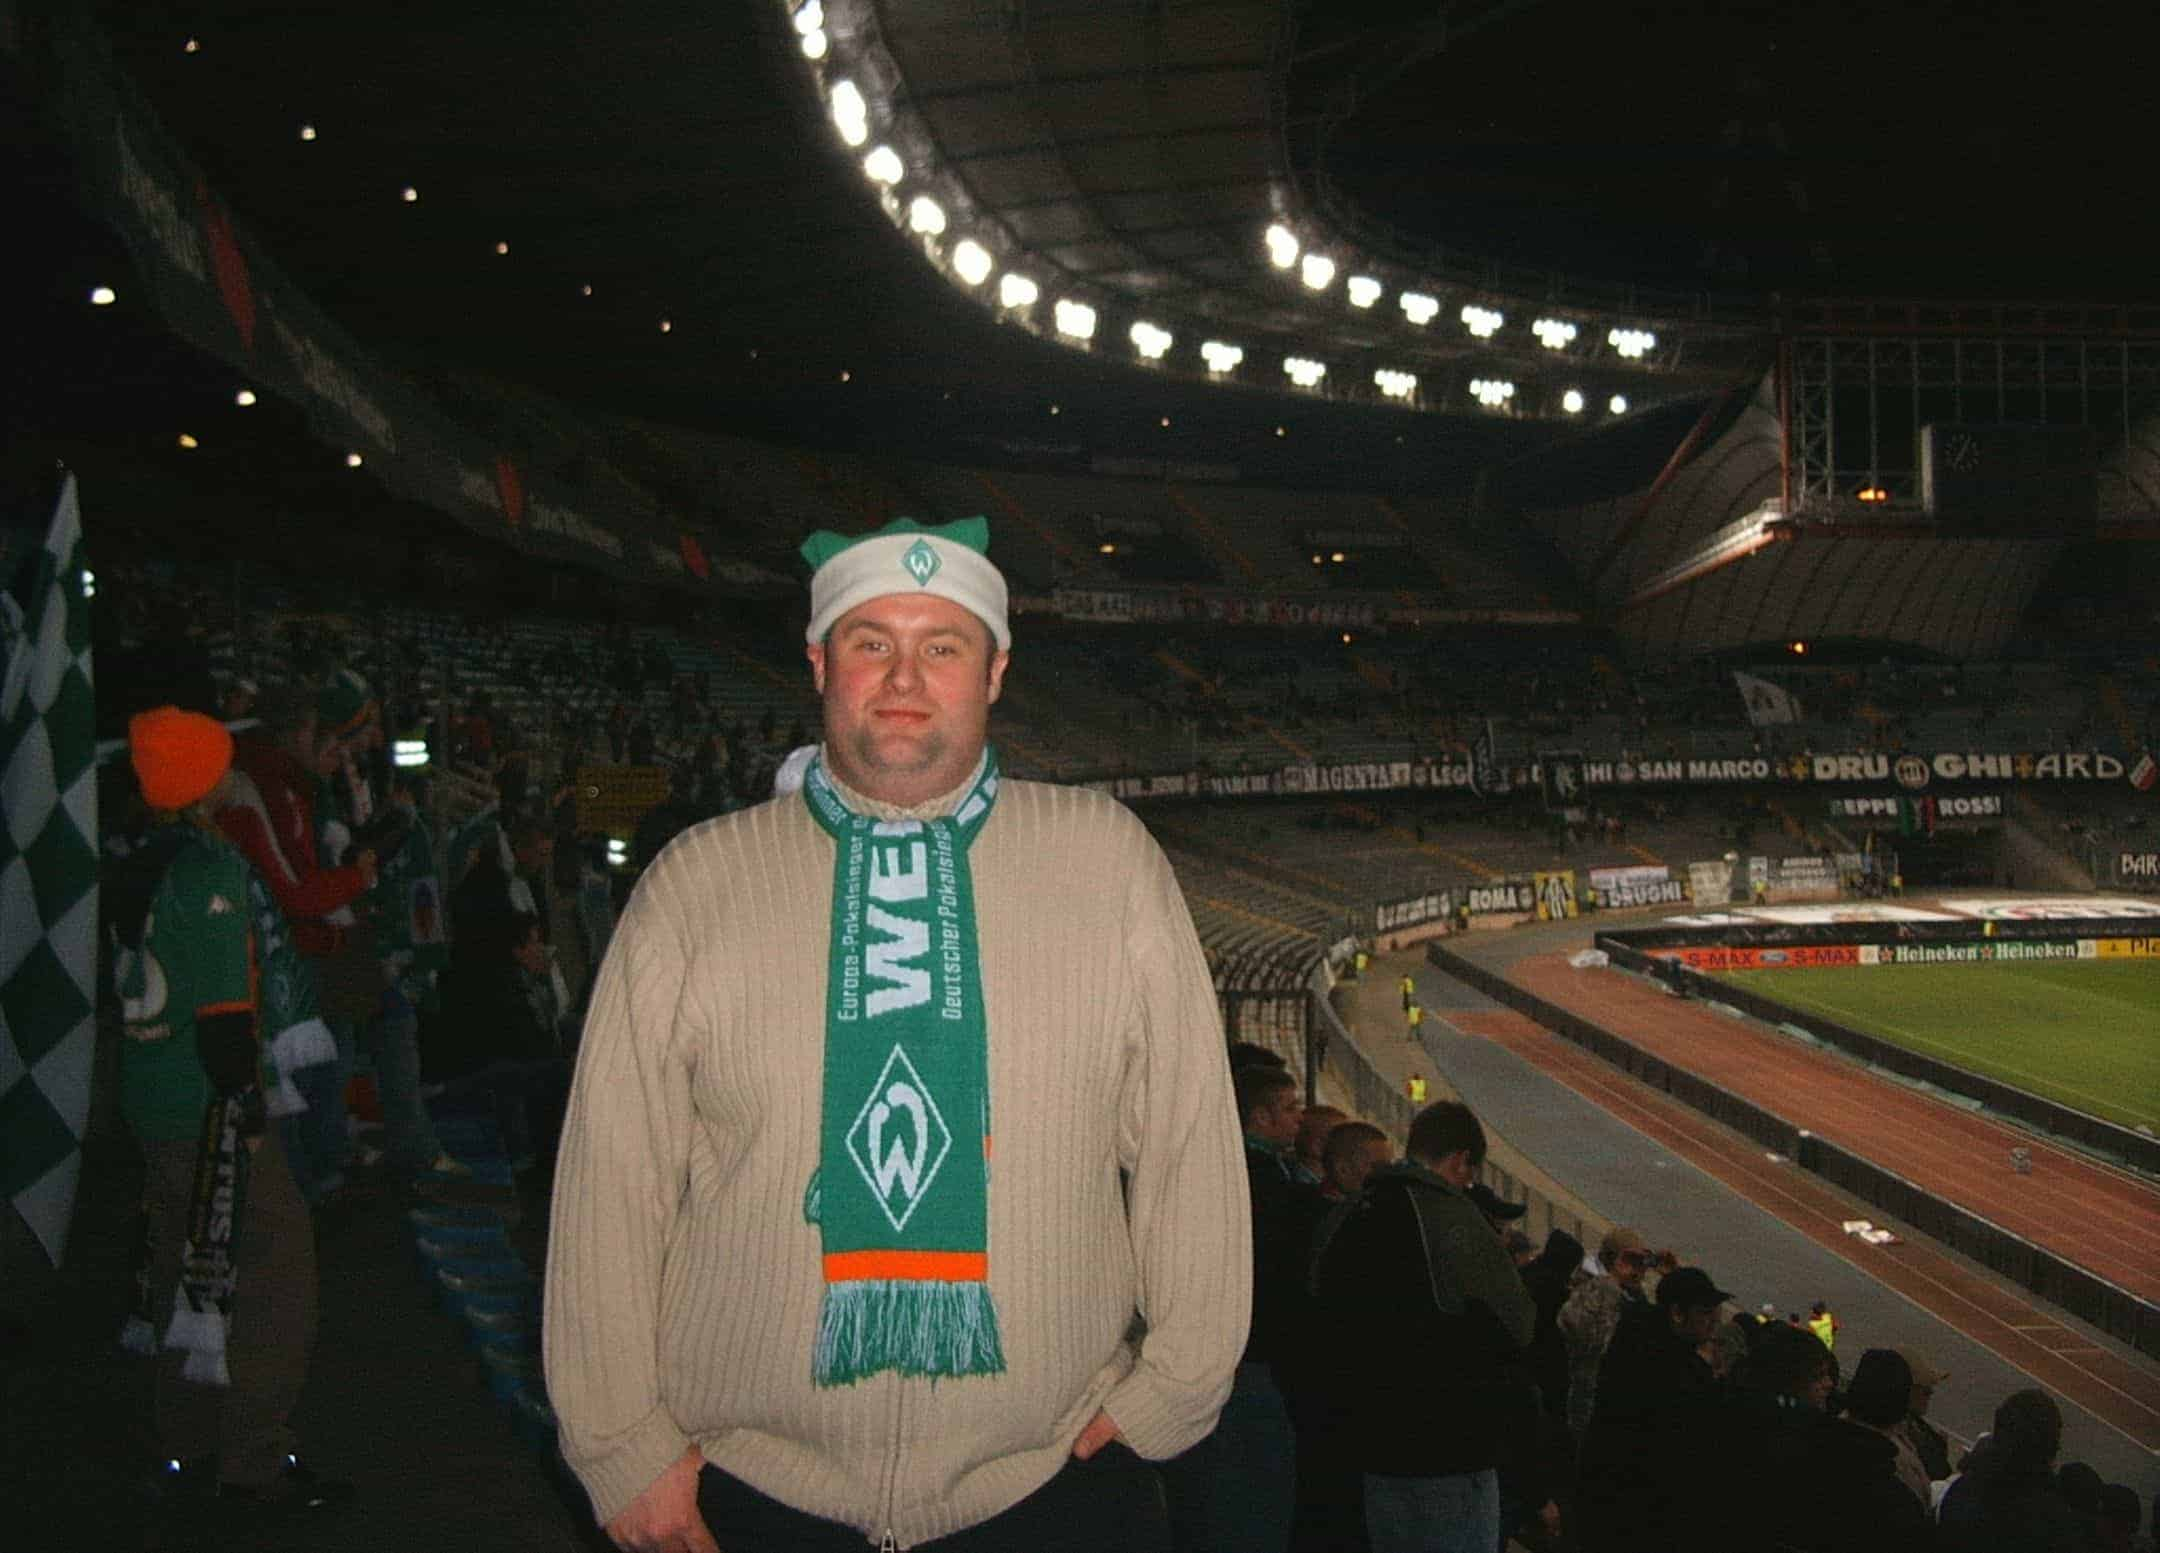 Juventus Turin vs. SV Werder Bremen (UEFA Champions League 2005/2006 Achtelfinale )